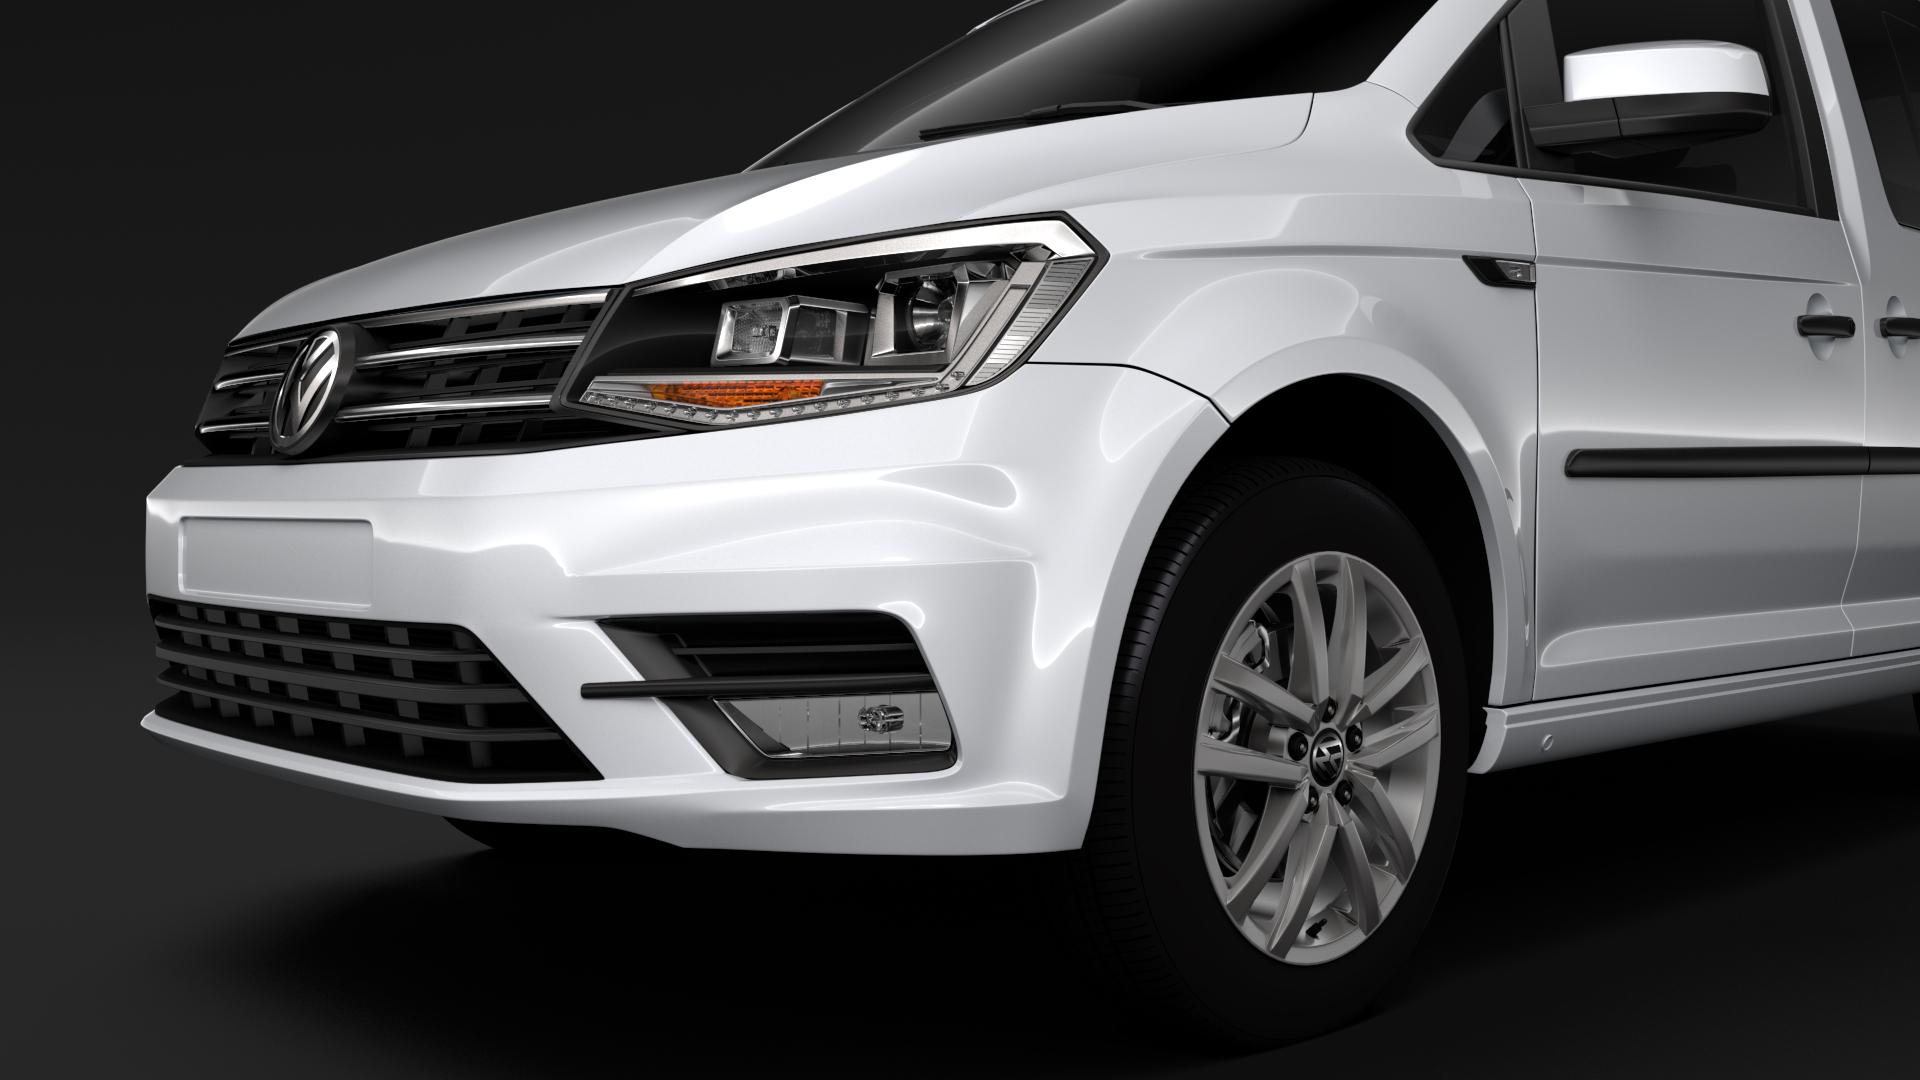 volkswagen caddy 2018 3d model max fbx c4d lwo ma mb hrc xsi obj 283800